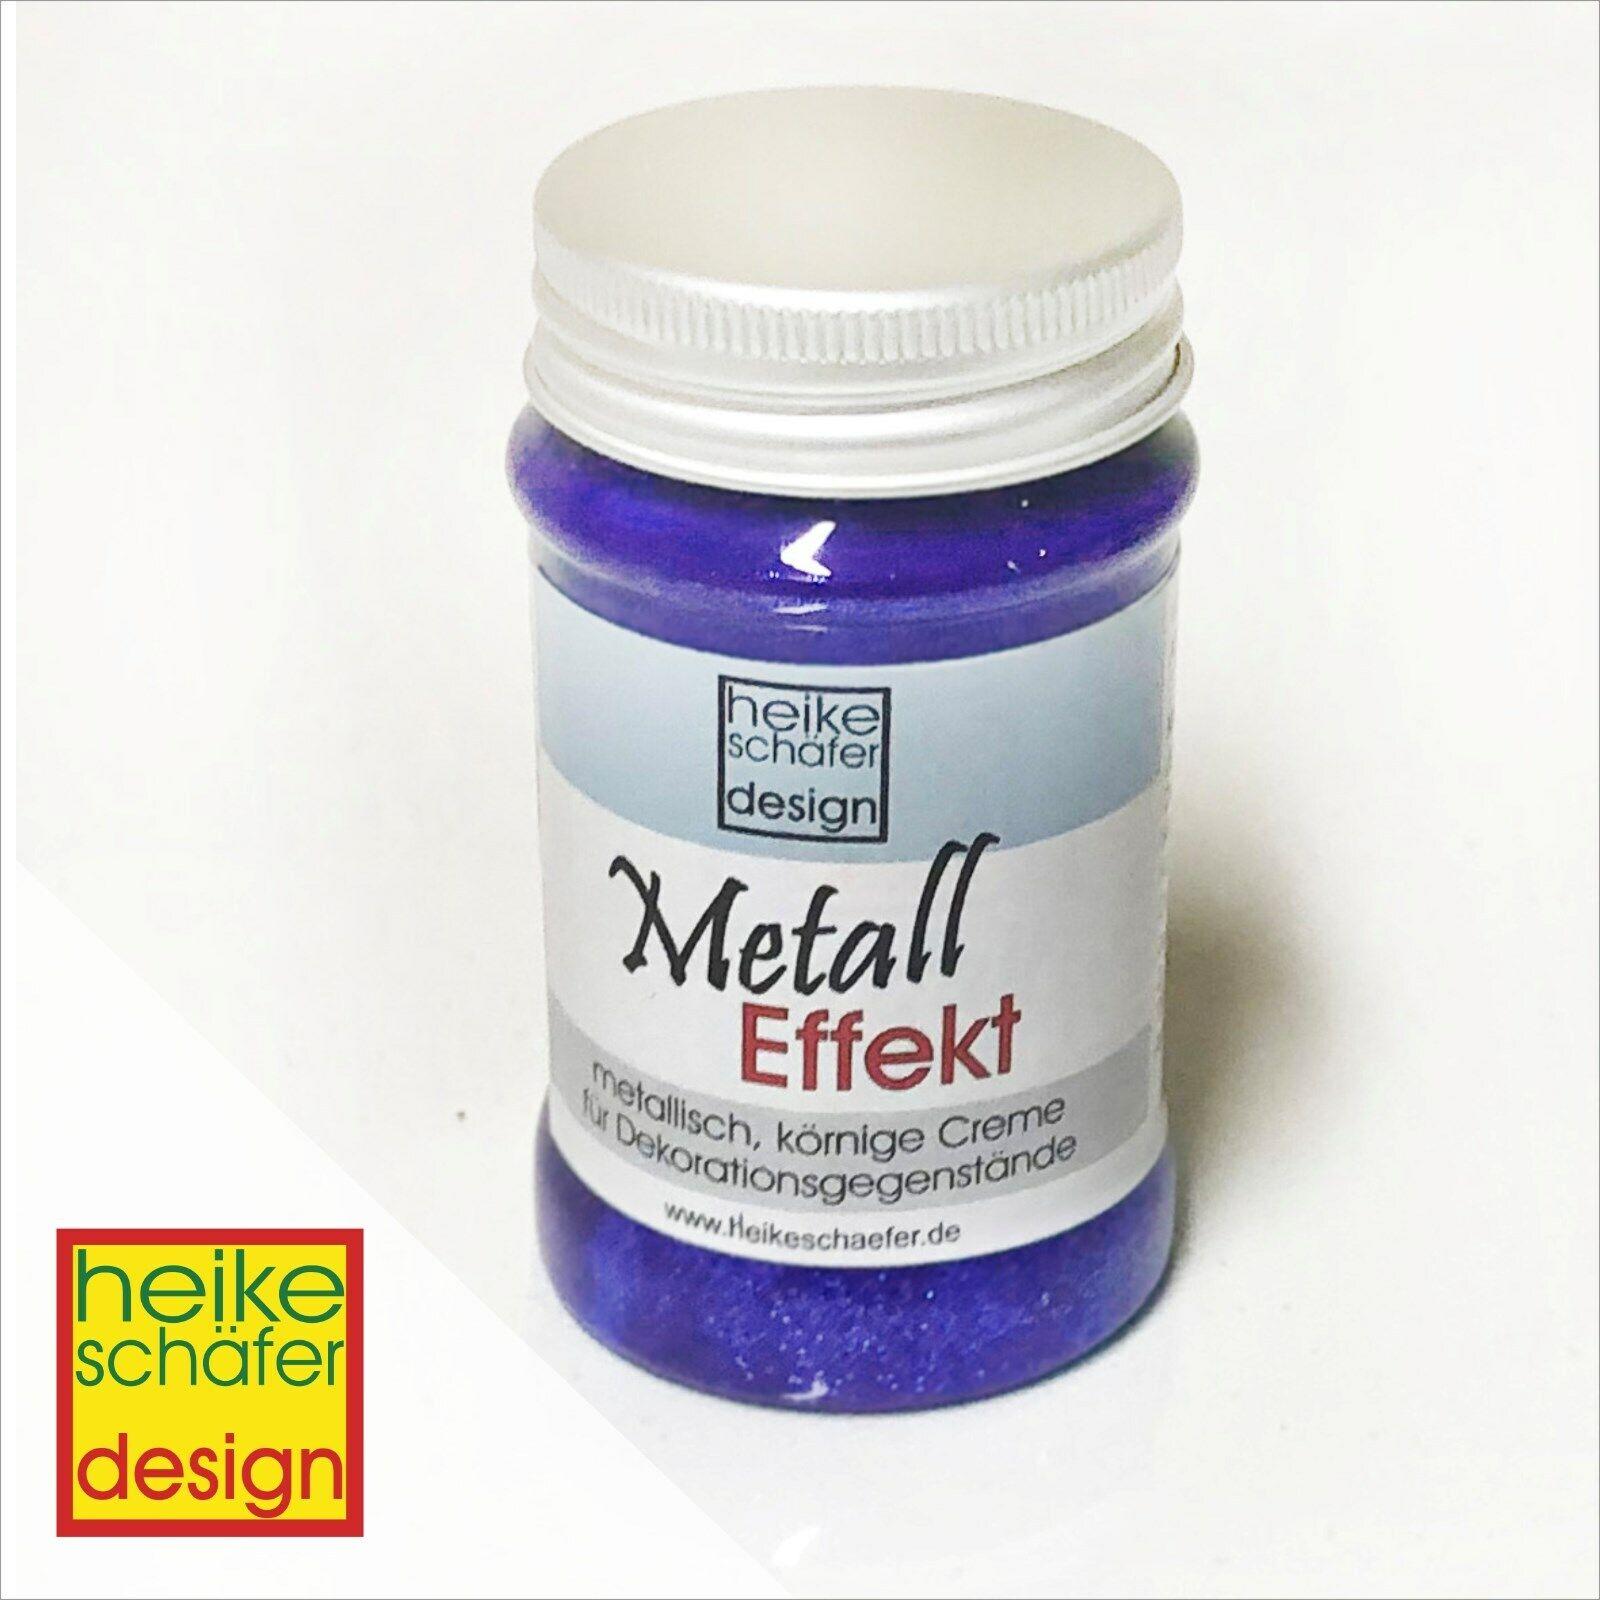 Metall Effekt Creme in Lila 90ml -Neu-  Heike Schäfer Design